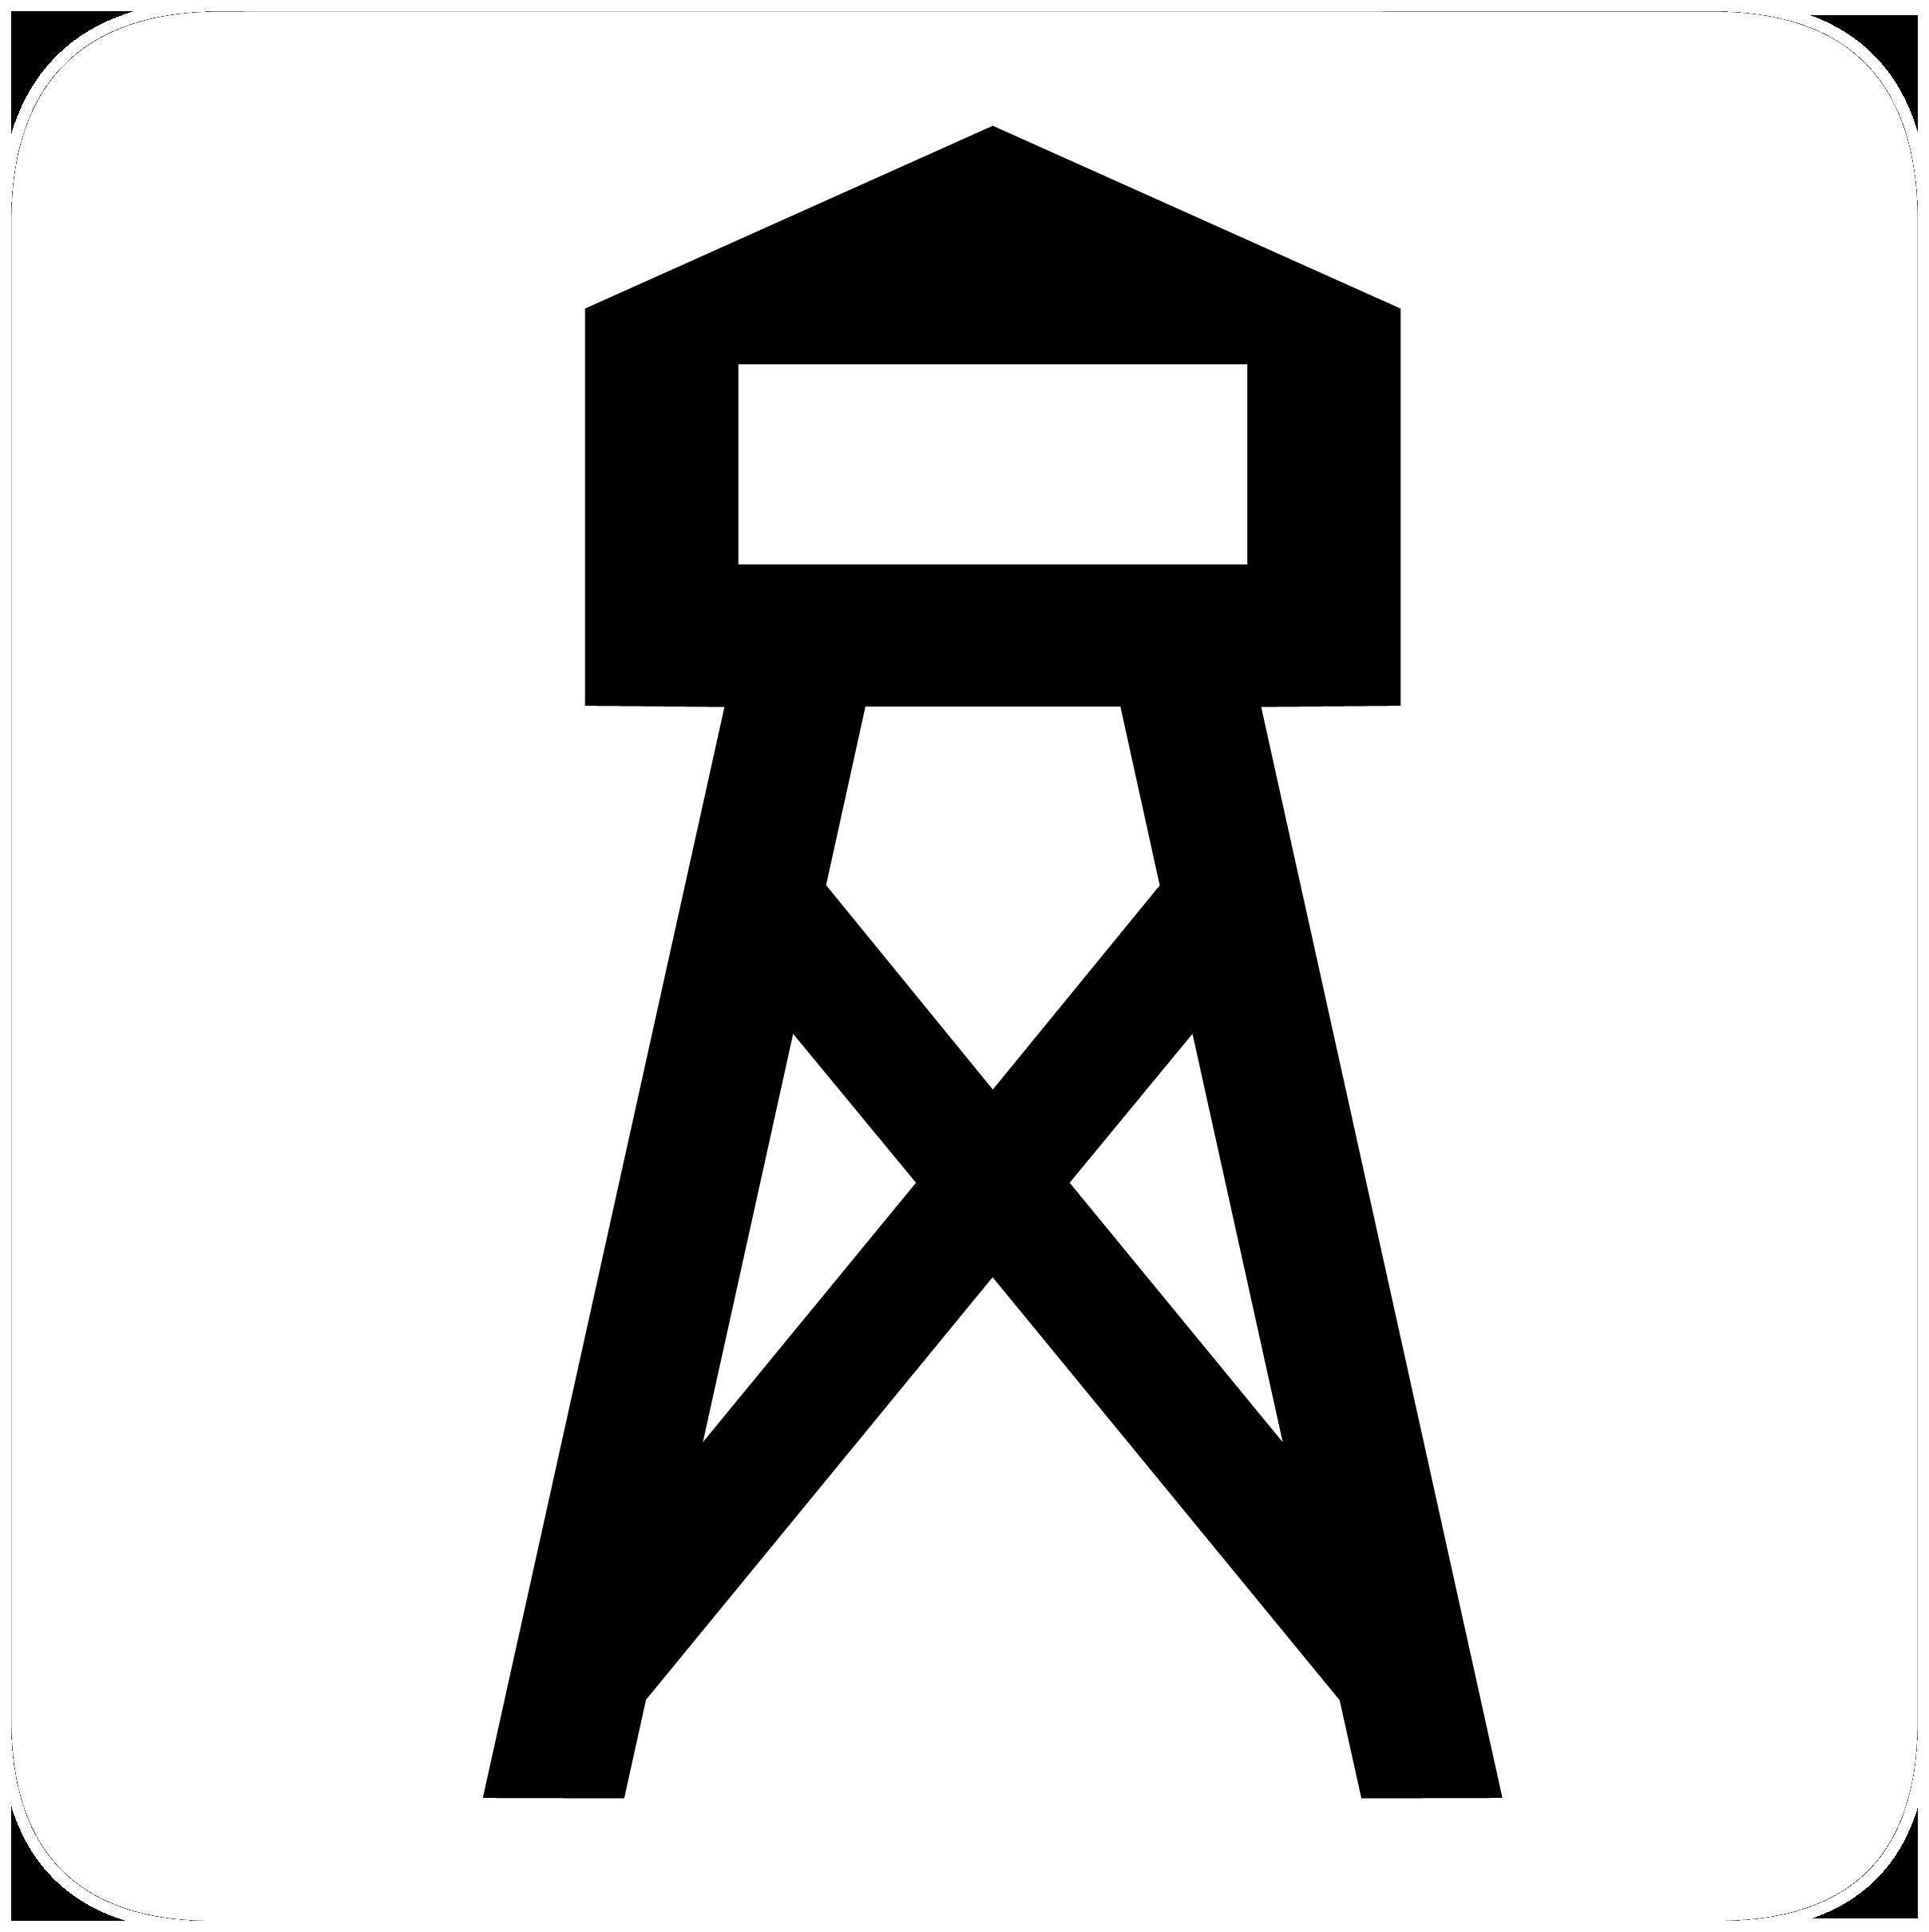 Oil clipart symbol. Index of awmc map